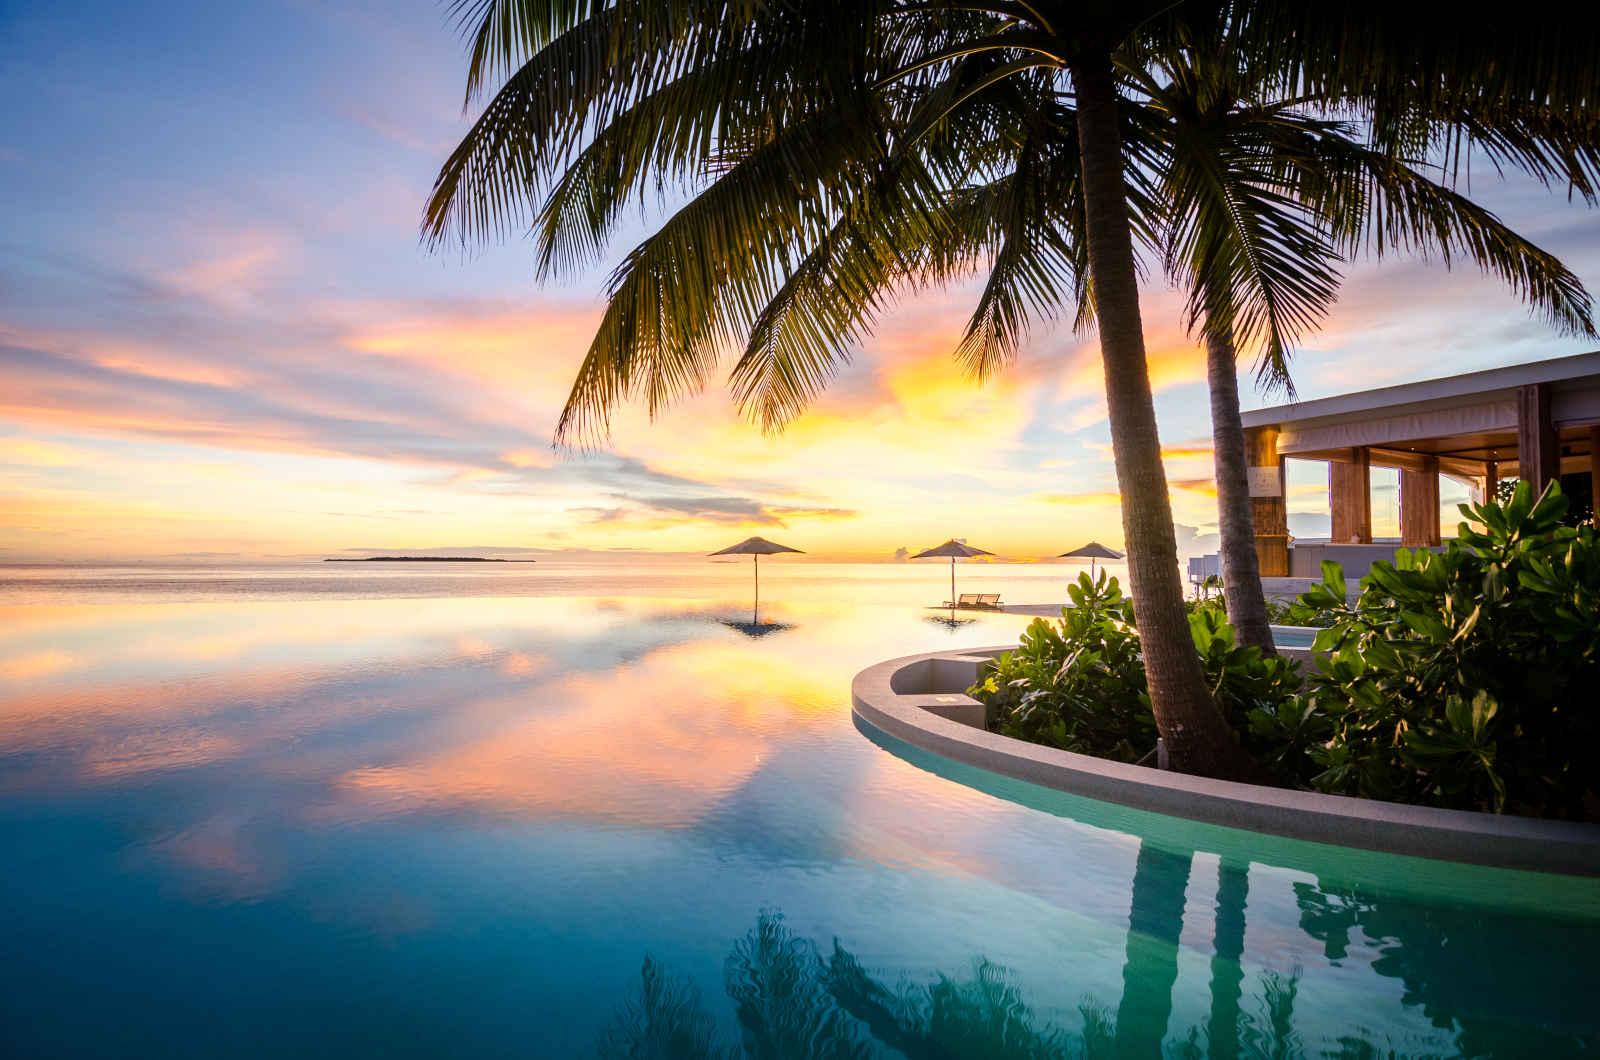 Maldives : Amilla Fushi